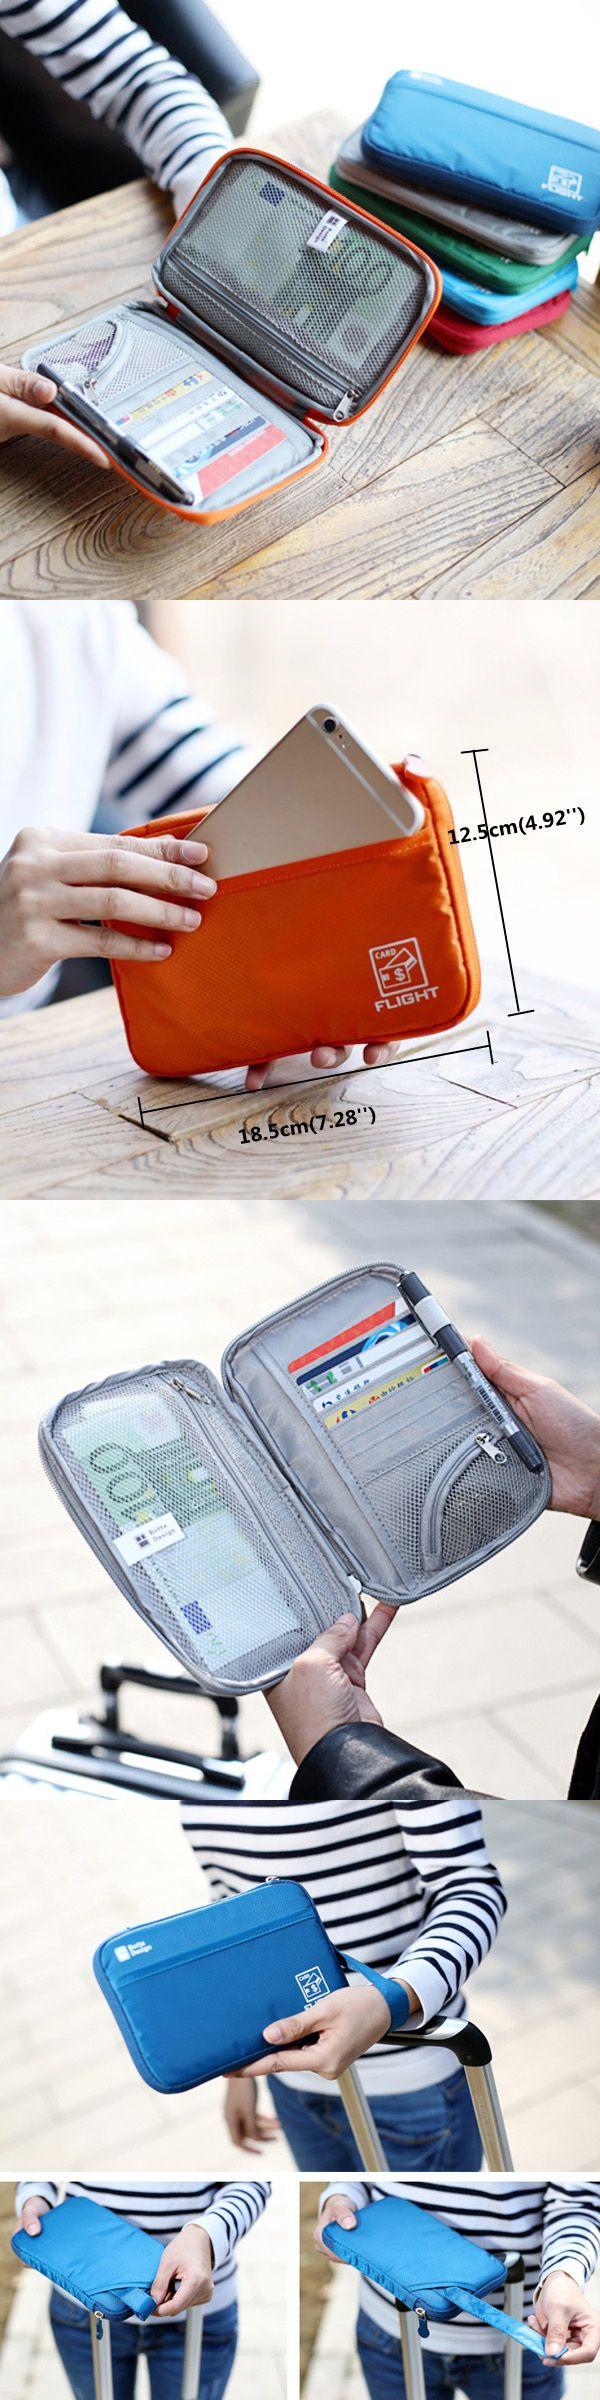 US$8.57 Nylon Multifunction Passport Wallet Purse _Cosmetic Bag_ Travel Storage Bag